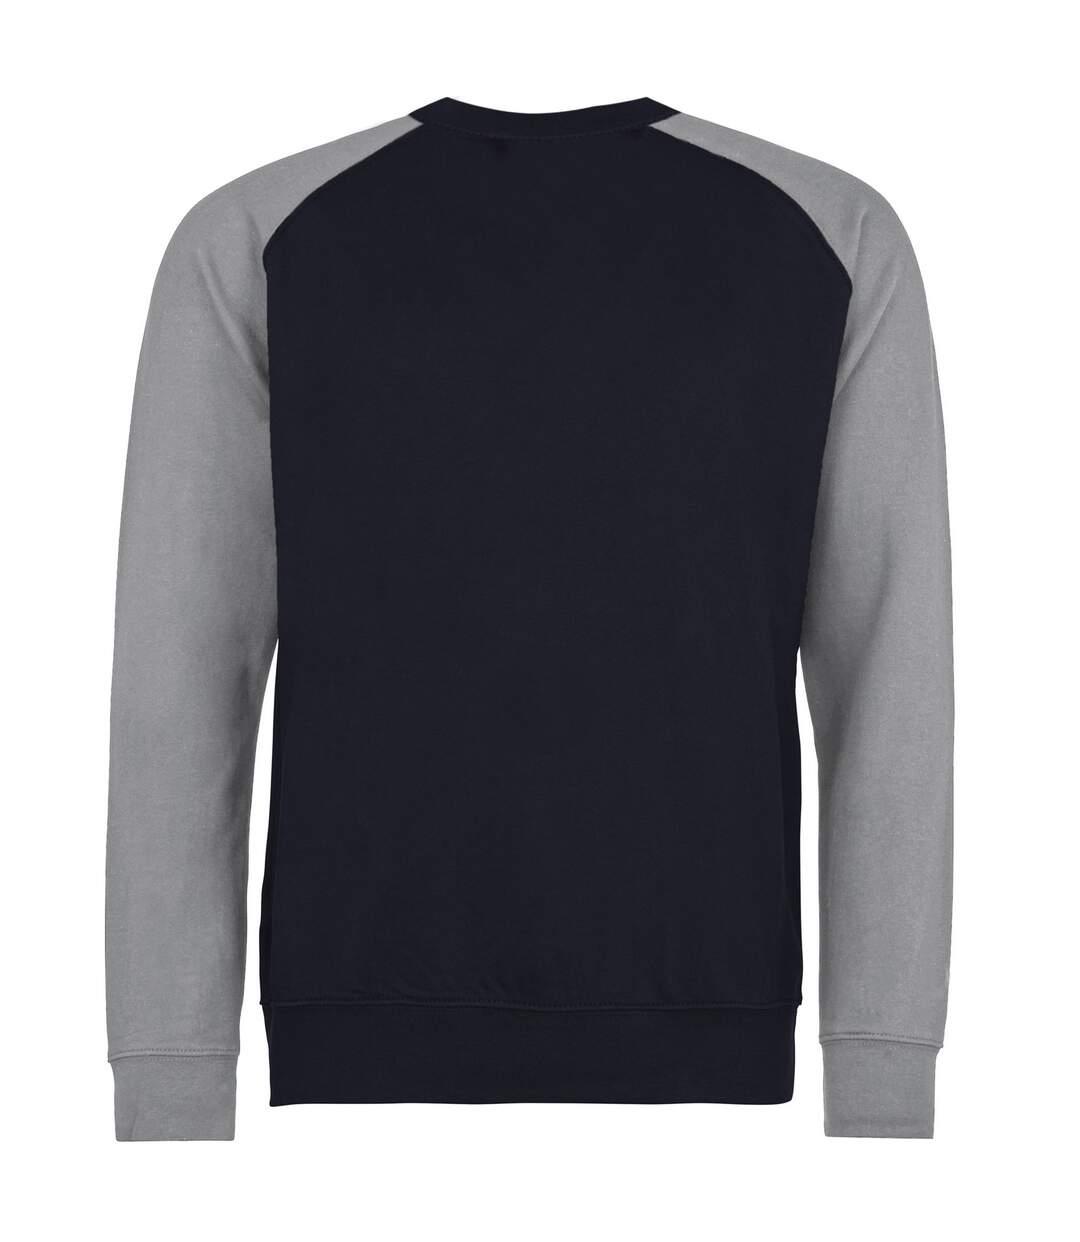 Awdis Mens Two Tone Cotton Rich Baseball Sweatshirt (Jet Black/Fire Red) - UTRW3929